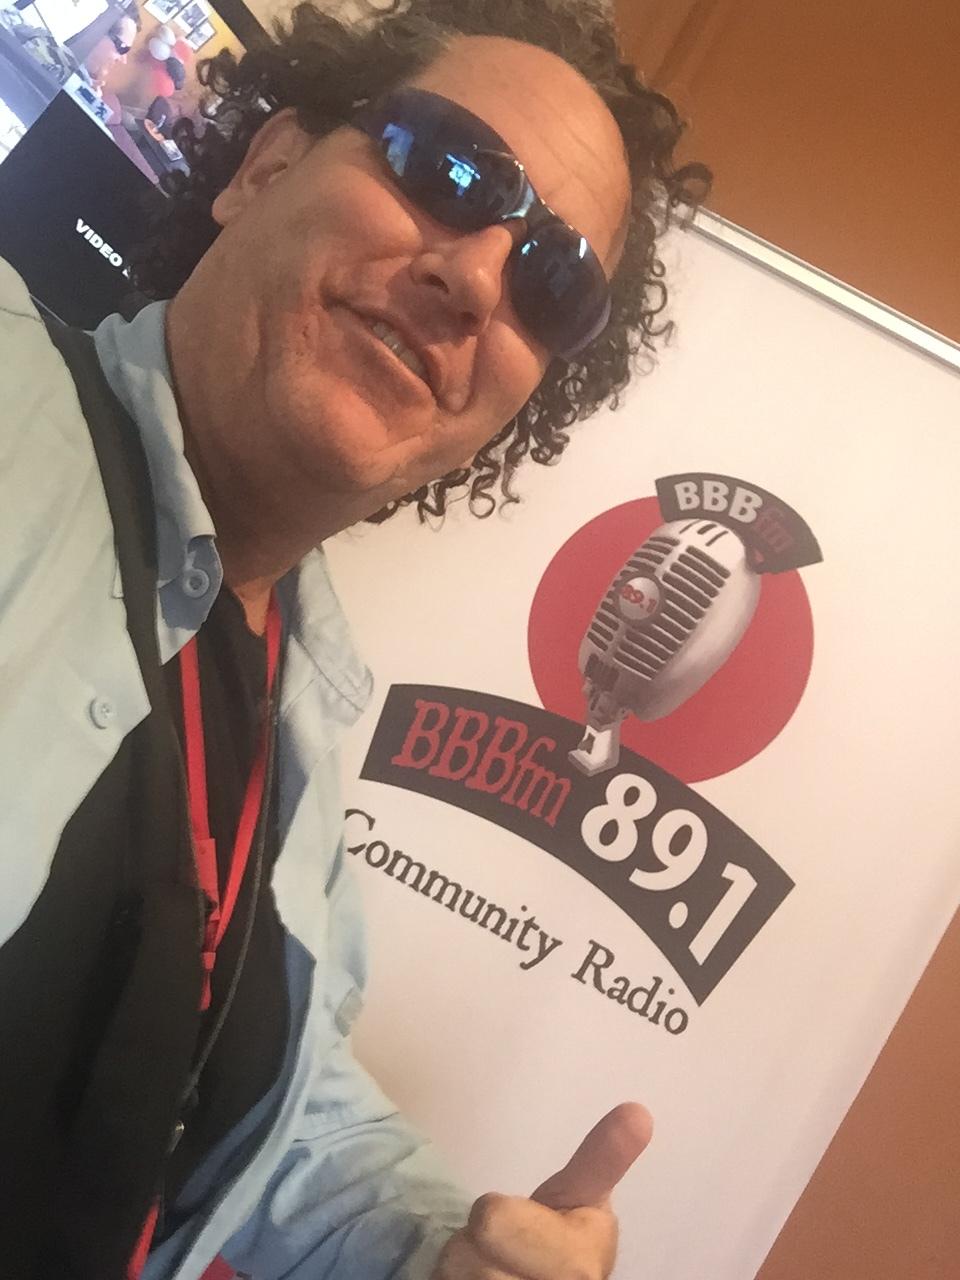 Radio Tour 25 BBBfm.jpg